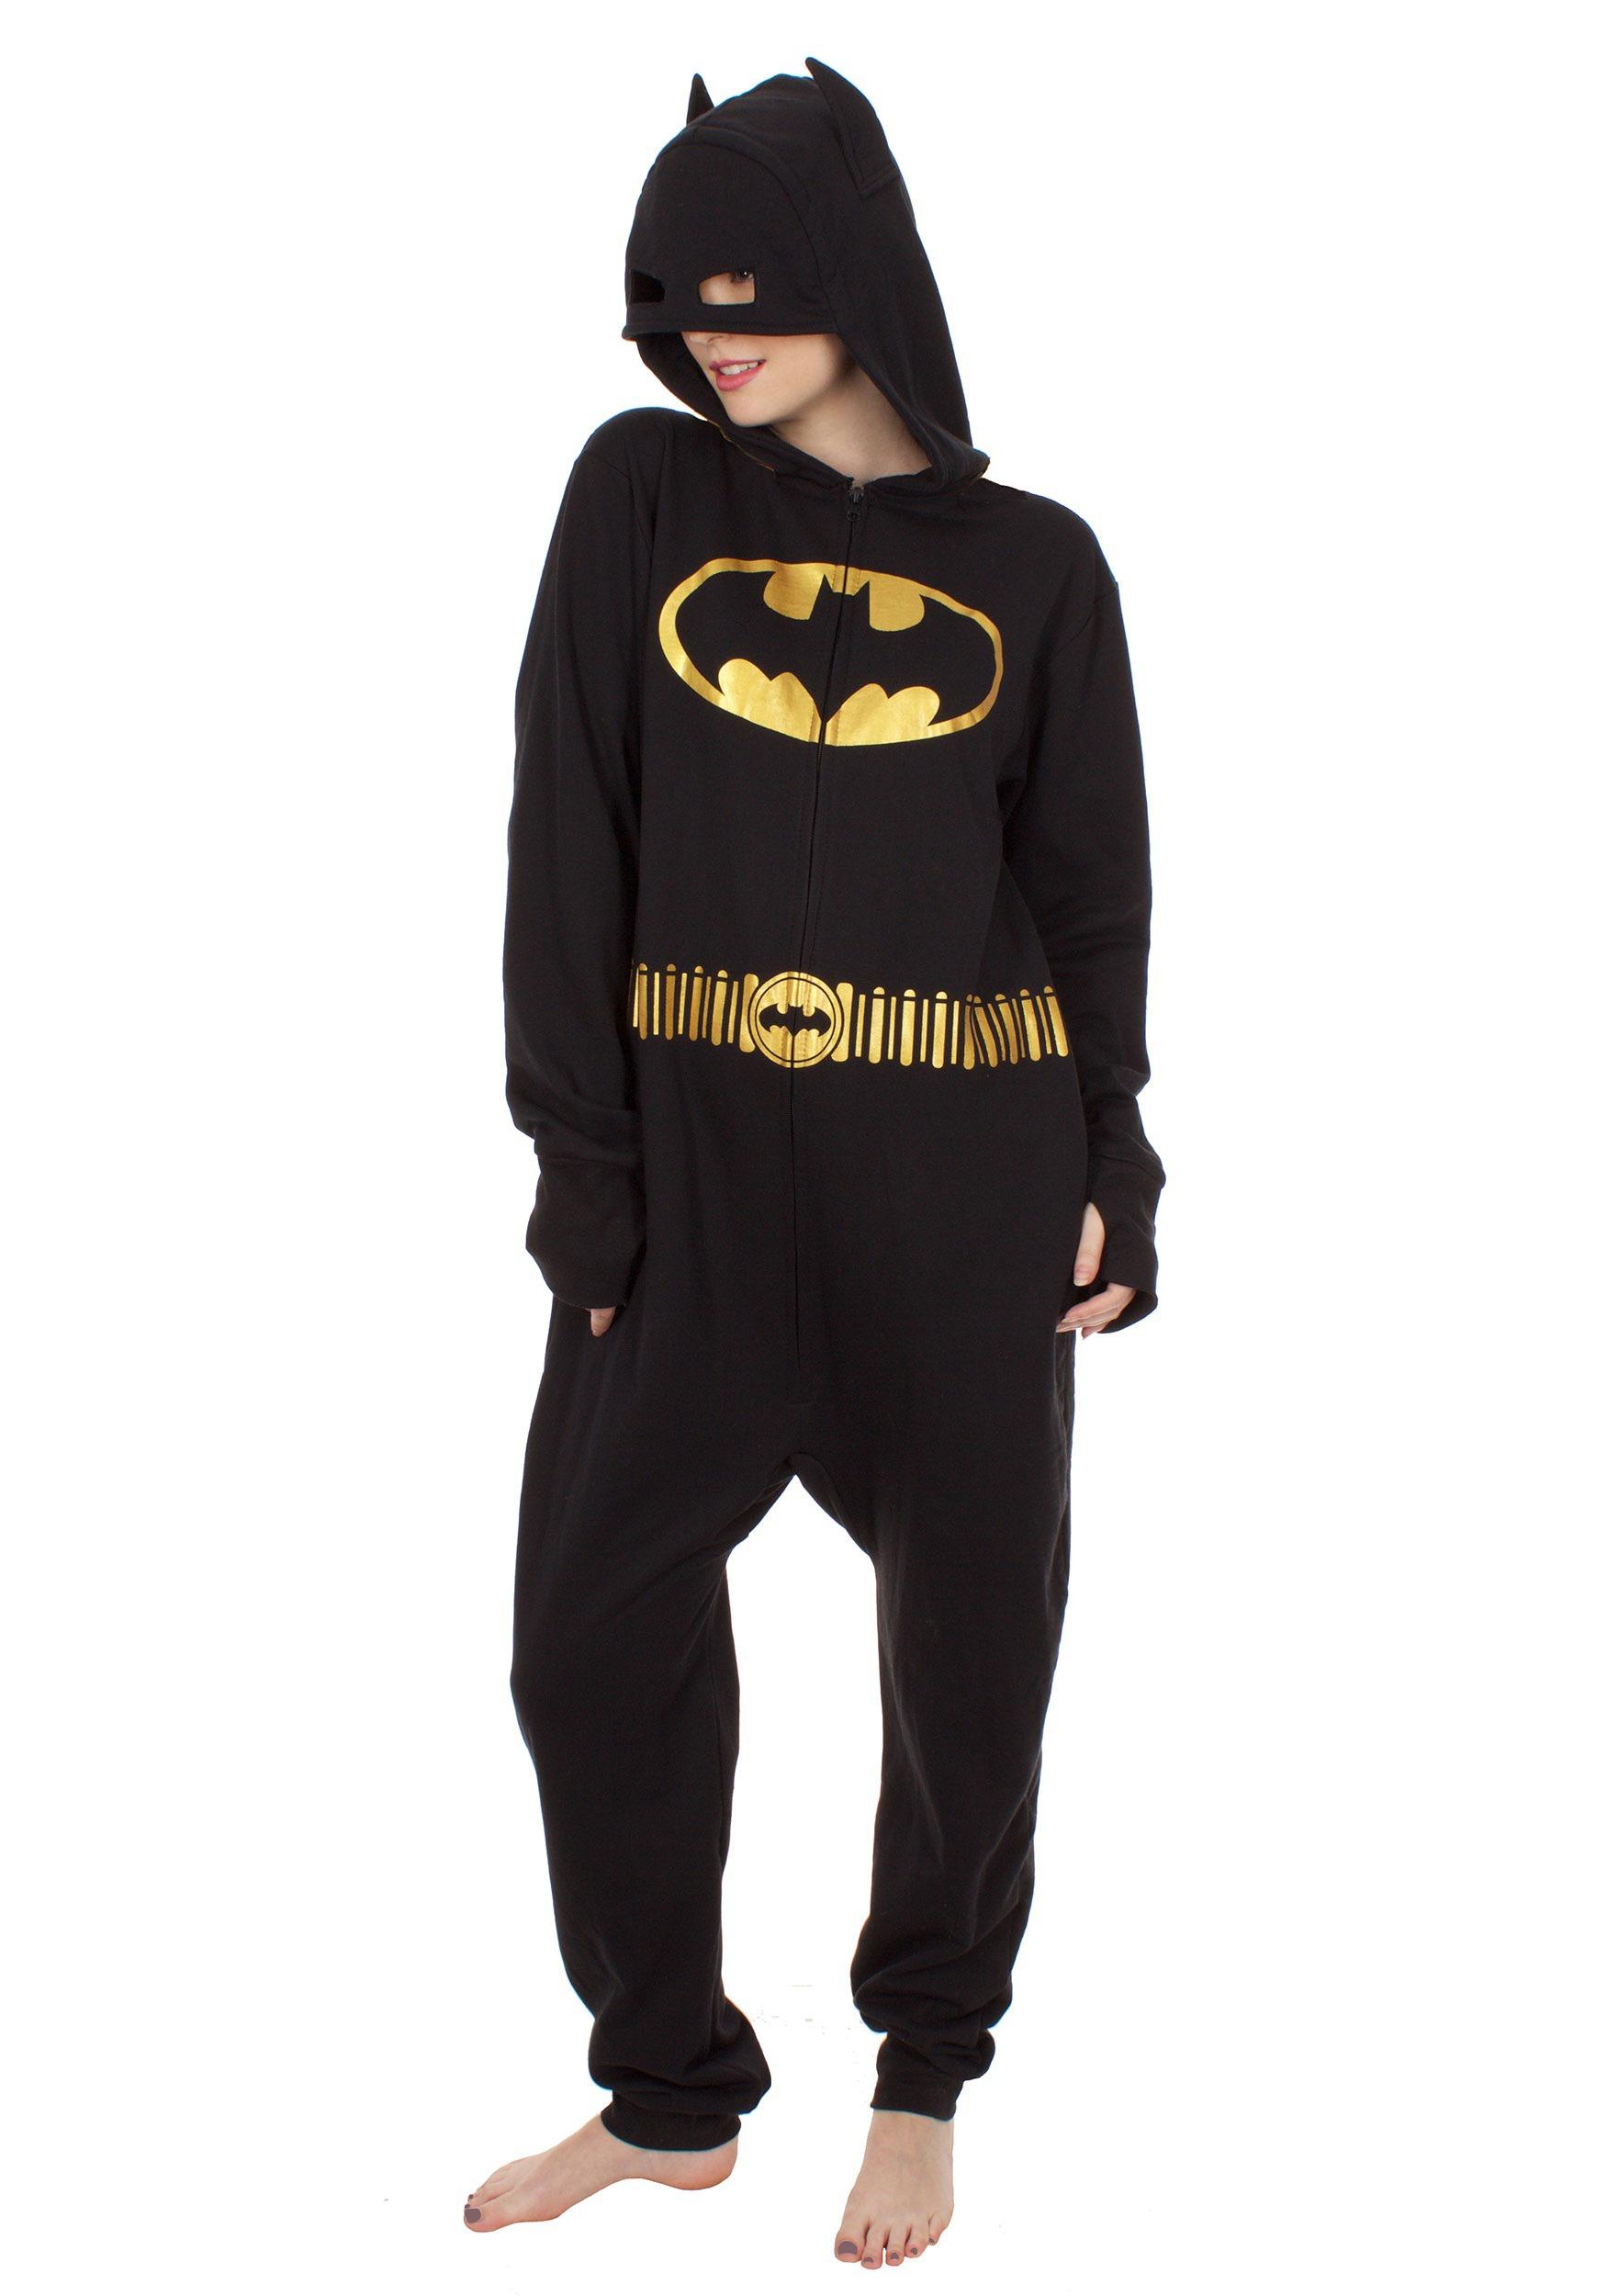 boxers comforter sleepwear most sets comfortable nightwear best pajamas fall cute image